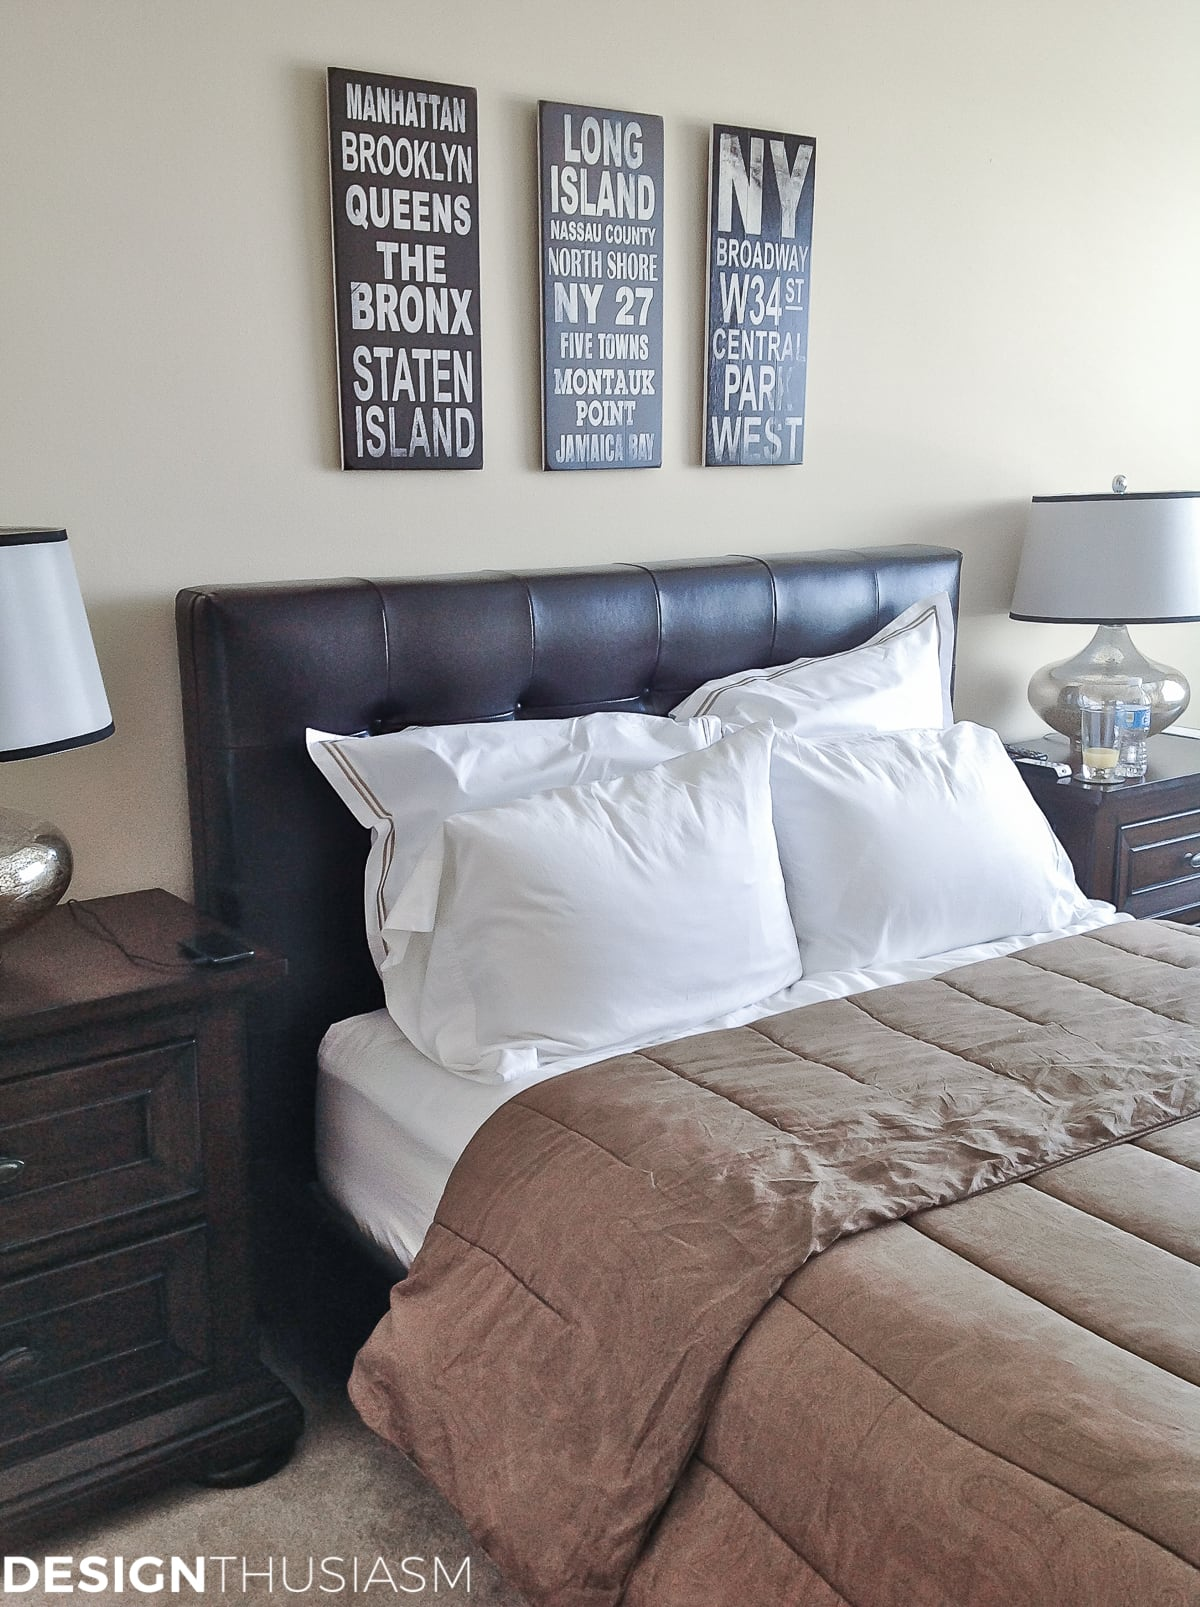 Bachelor Pad Decor Part 3 Classic Mens Bedroom Ideas